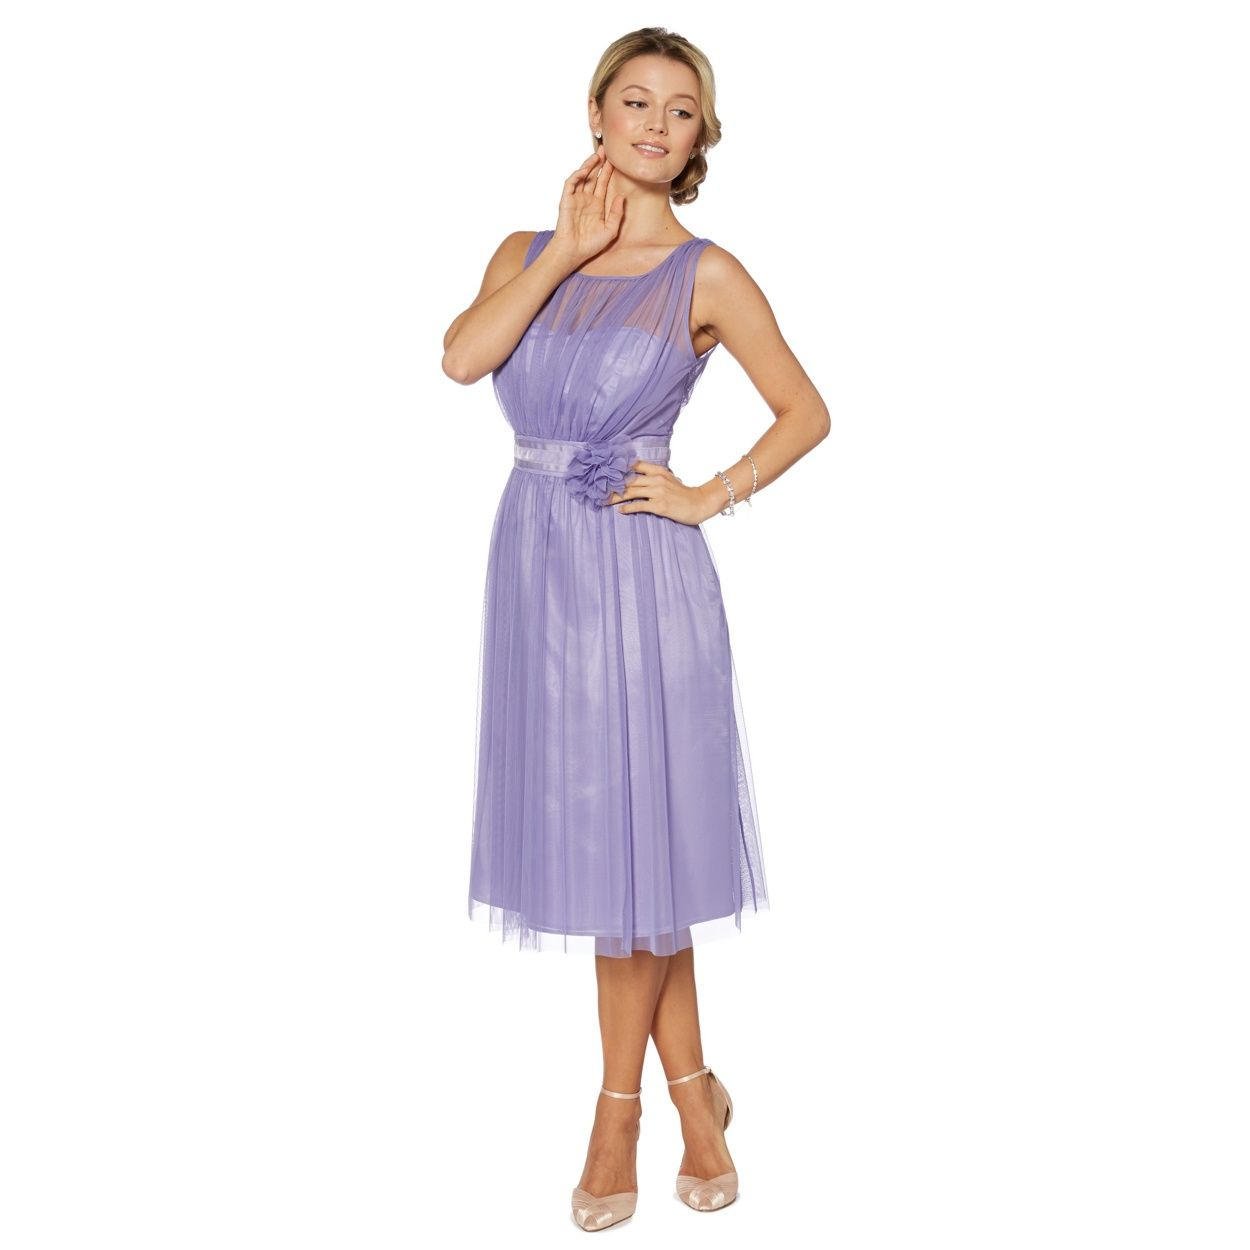 Debut Lilac mesh build corsage midi dress- at Debenhams.com ...